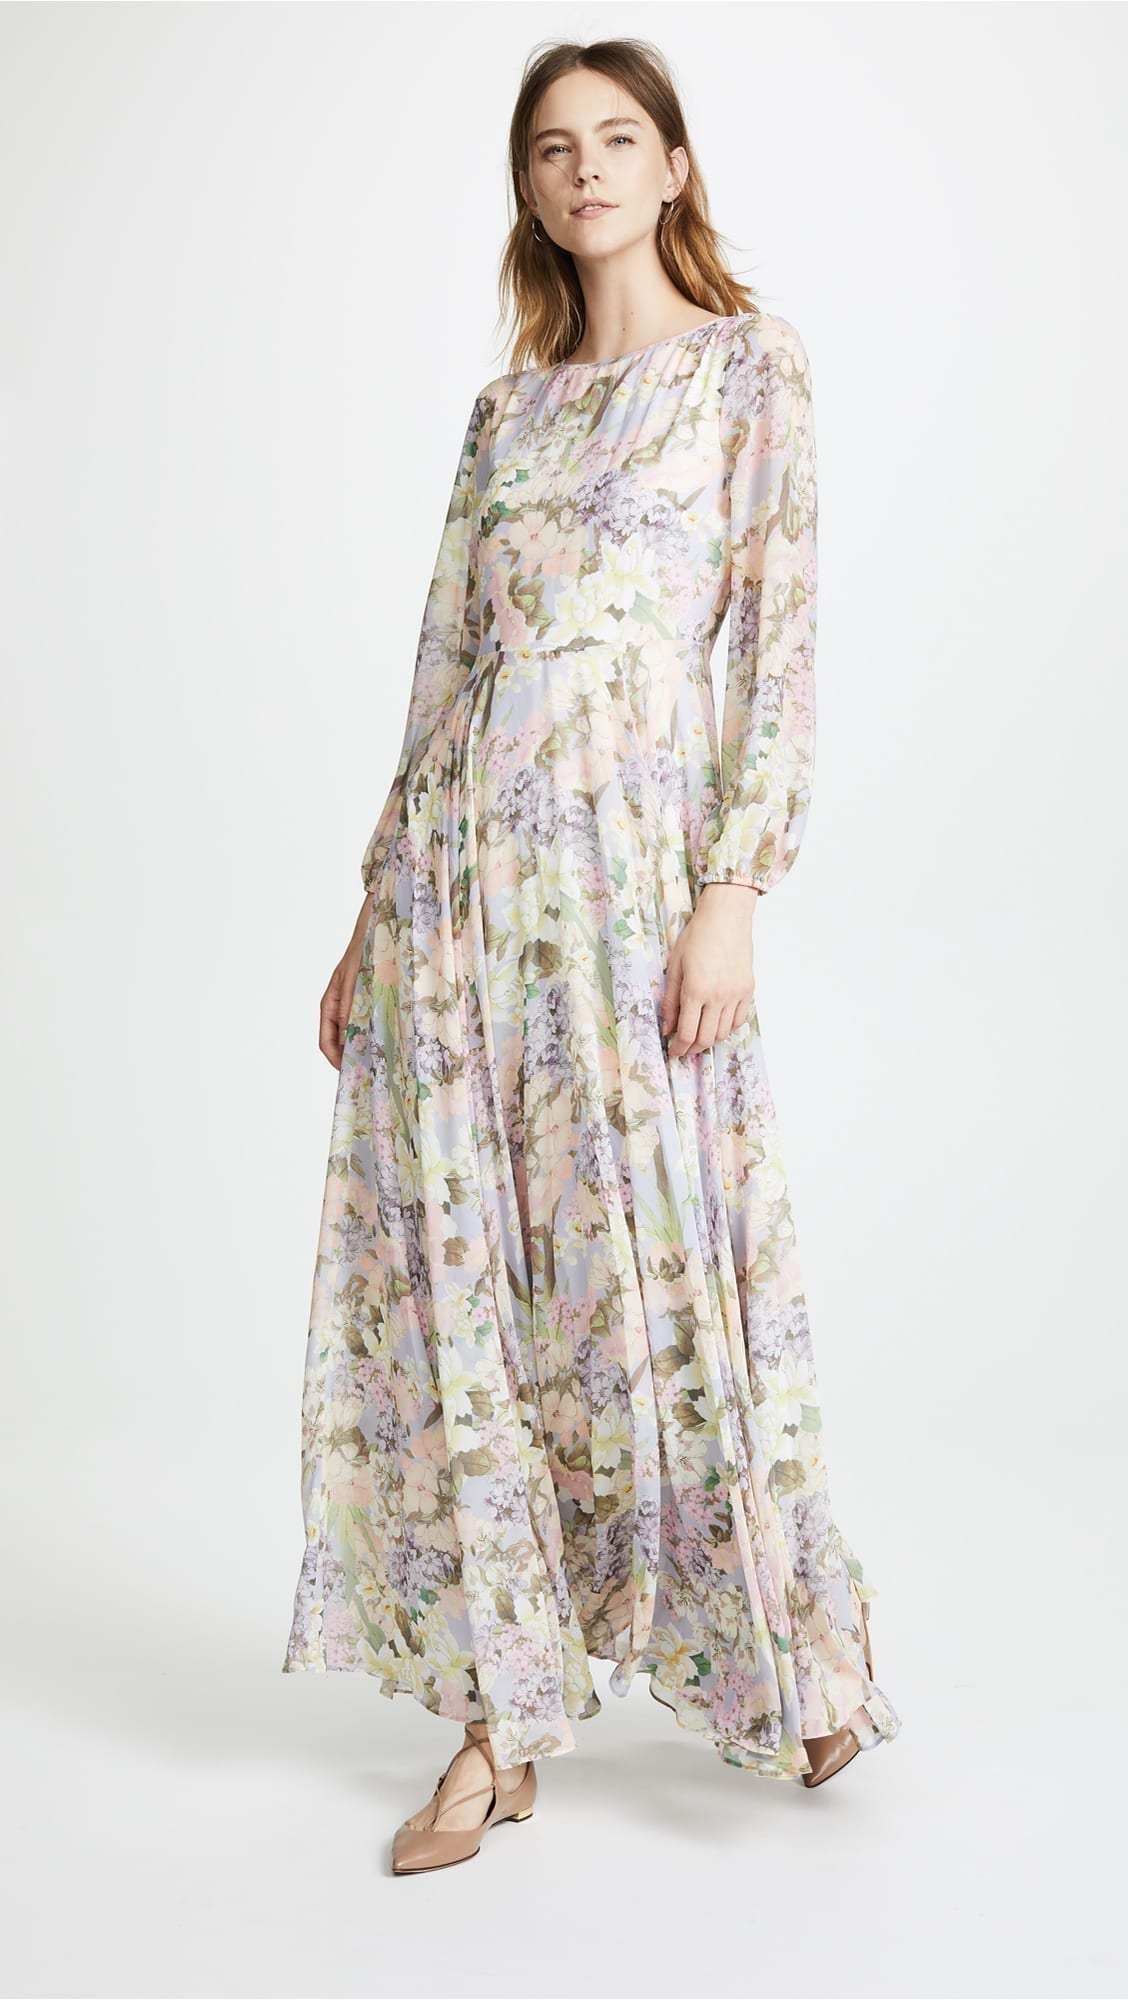 YUMI KIM True Love Maxi Garden Light Oasis / Floral Printed Dress